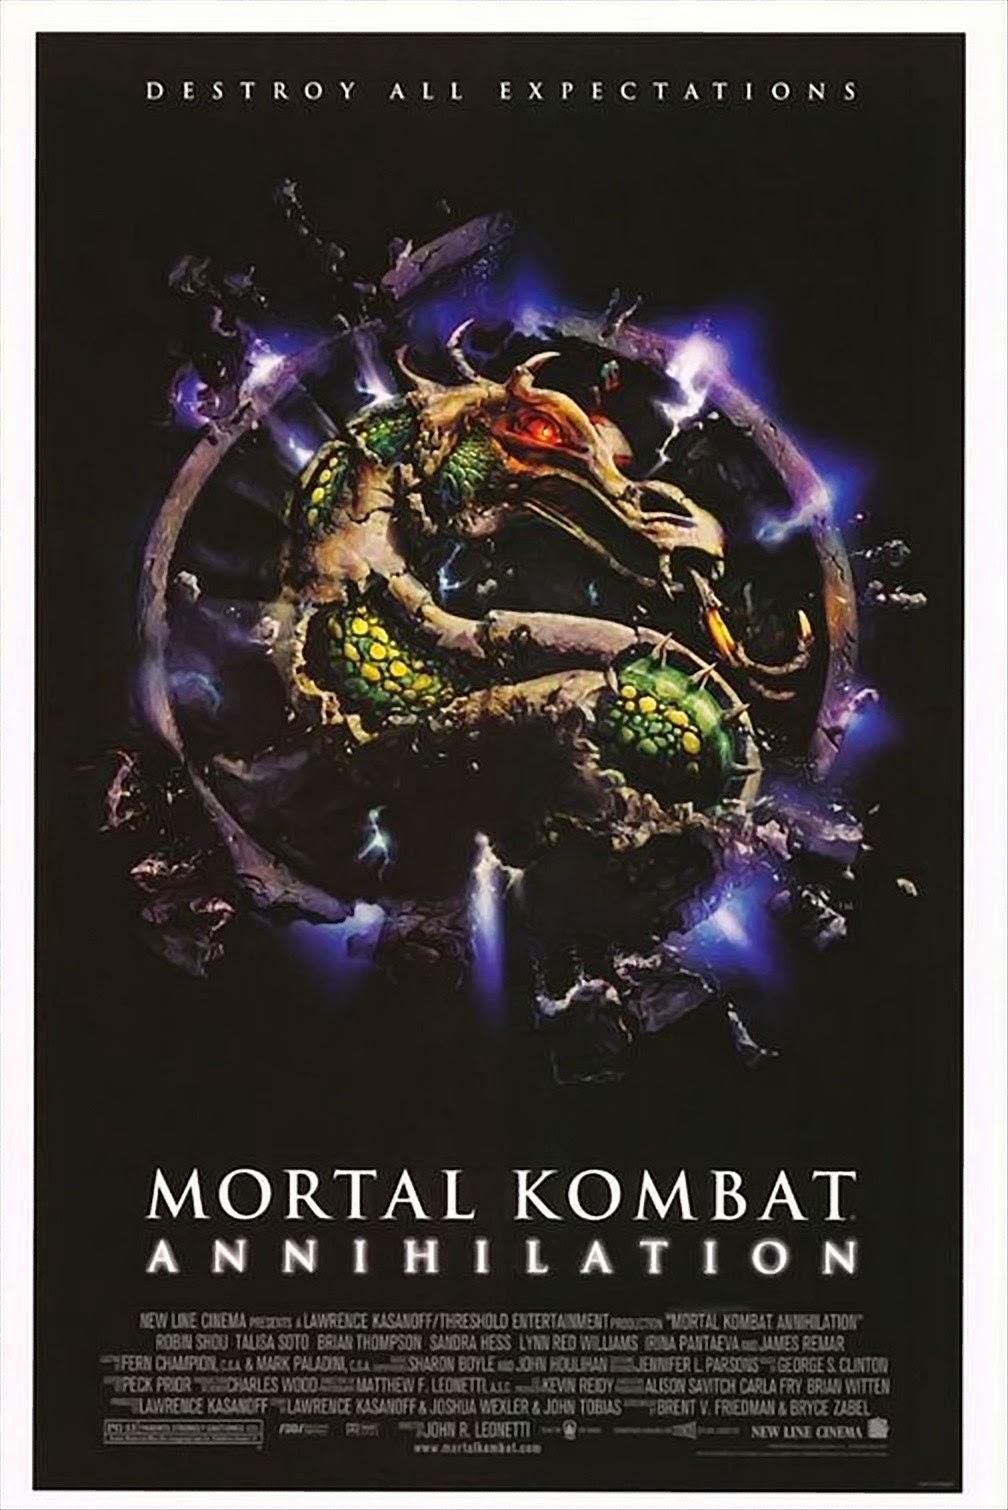 Mortal Kombat Annihilation (1997) ταινιες online seires oipeirates greek subs